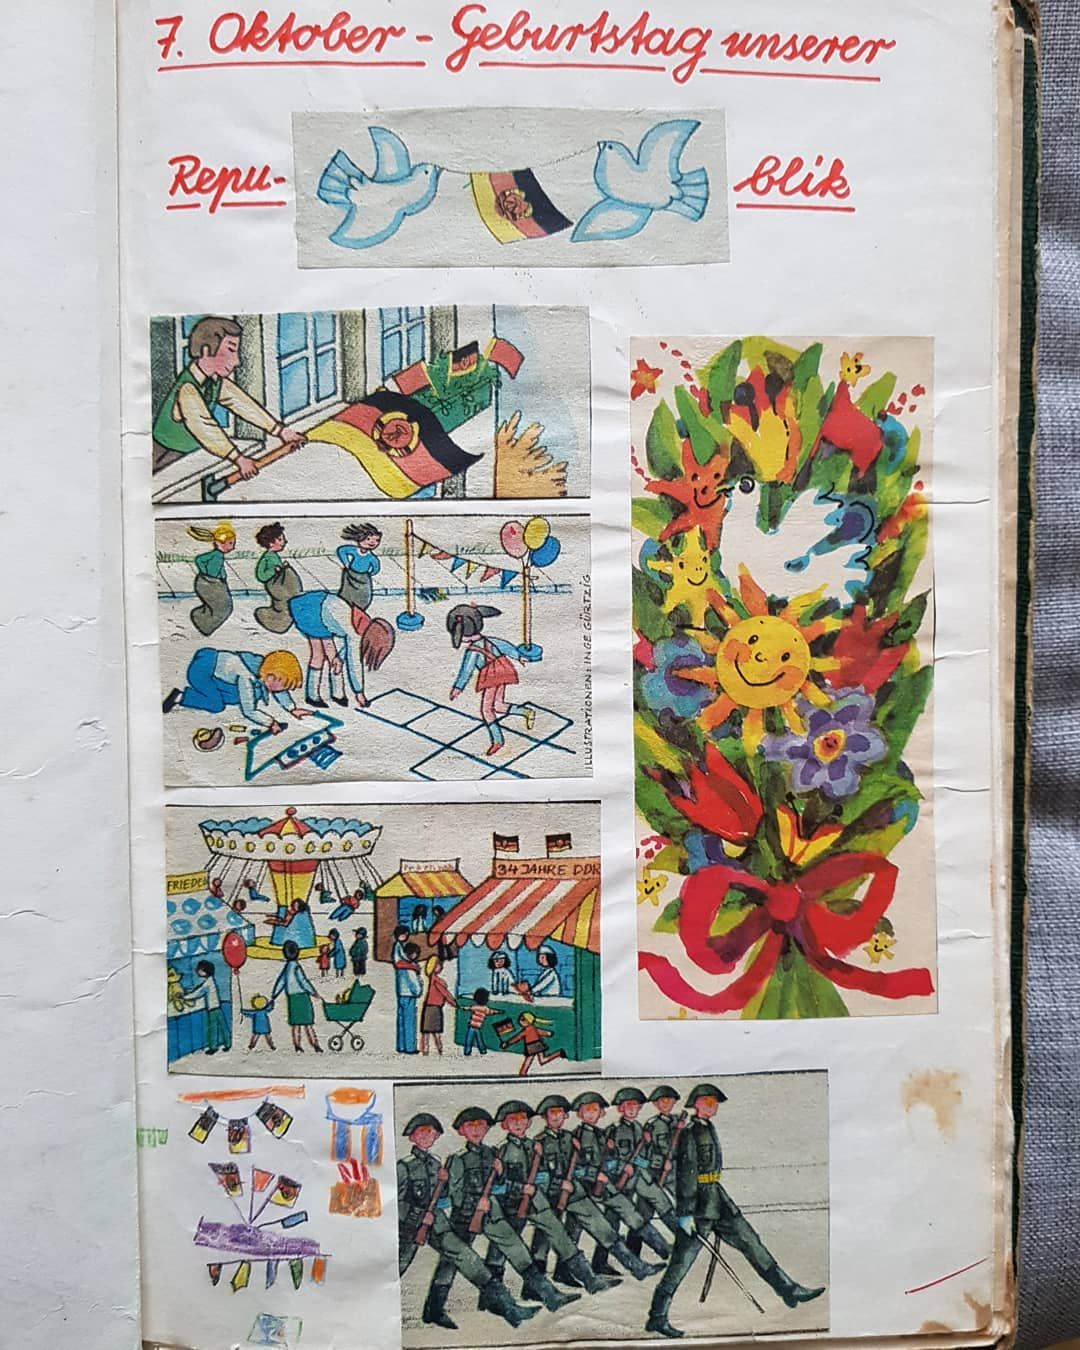 Heimatkunde 1984 Omg Ddr Oktober Feiertag Geburtstag